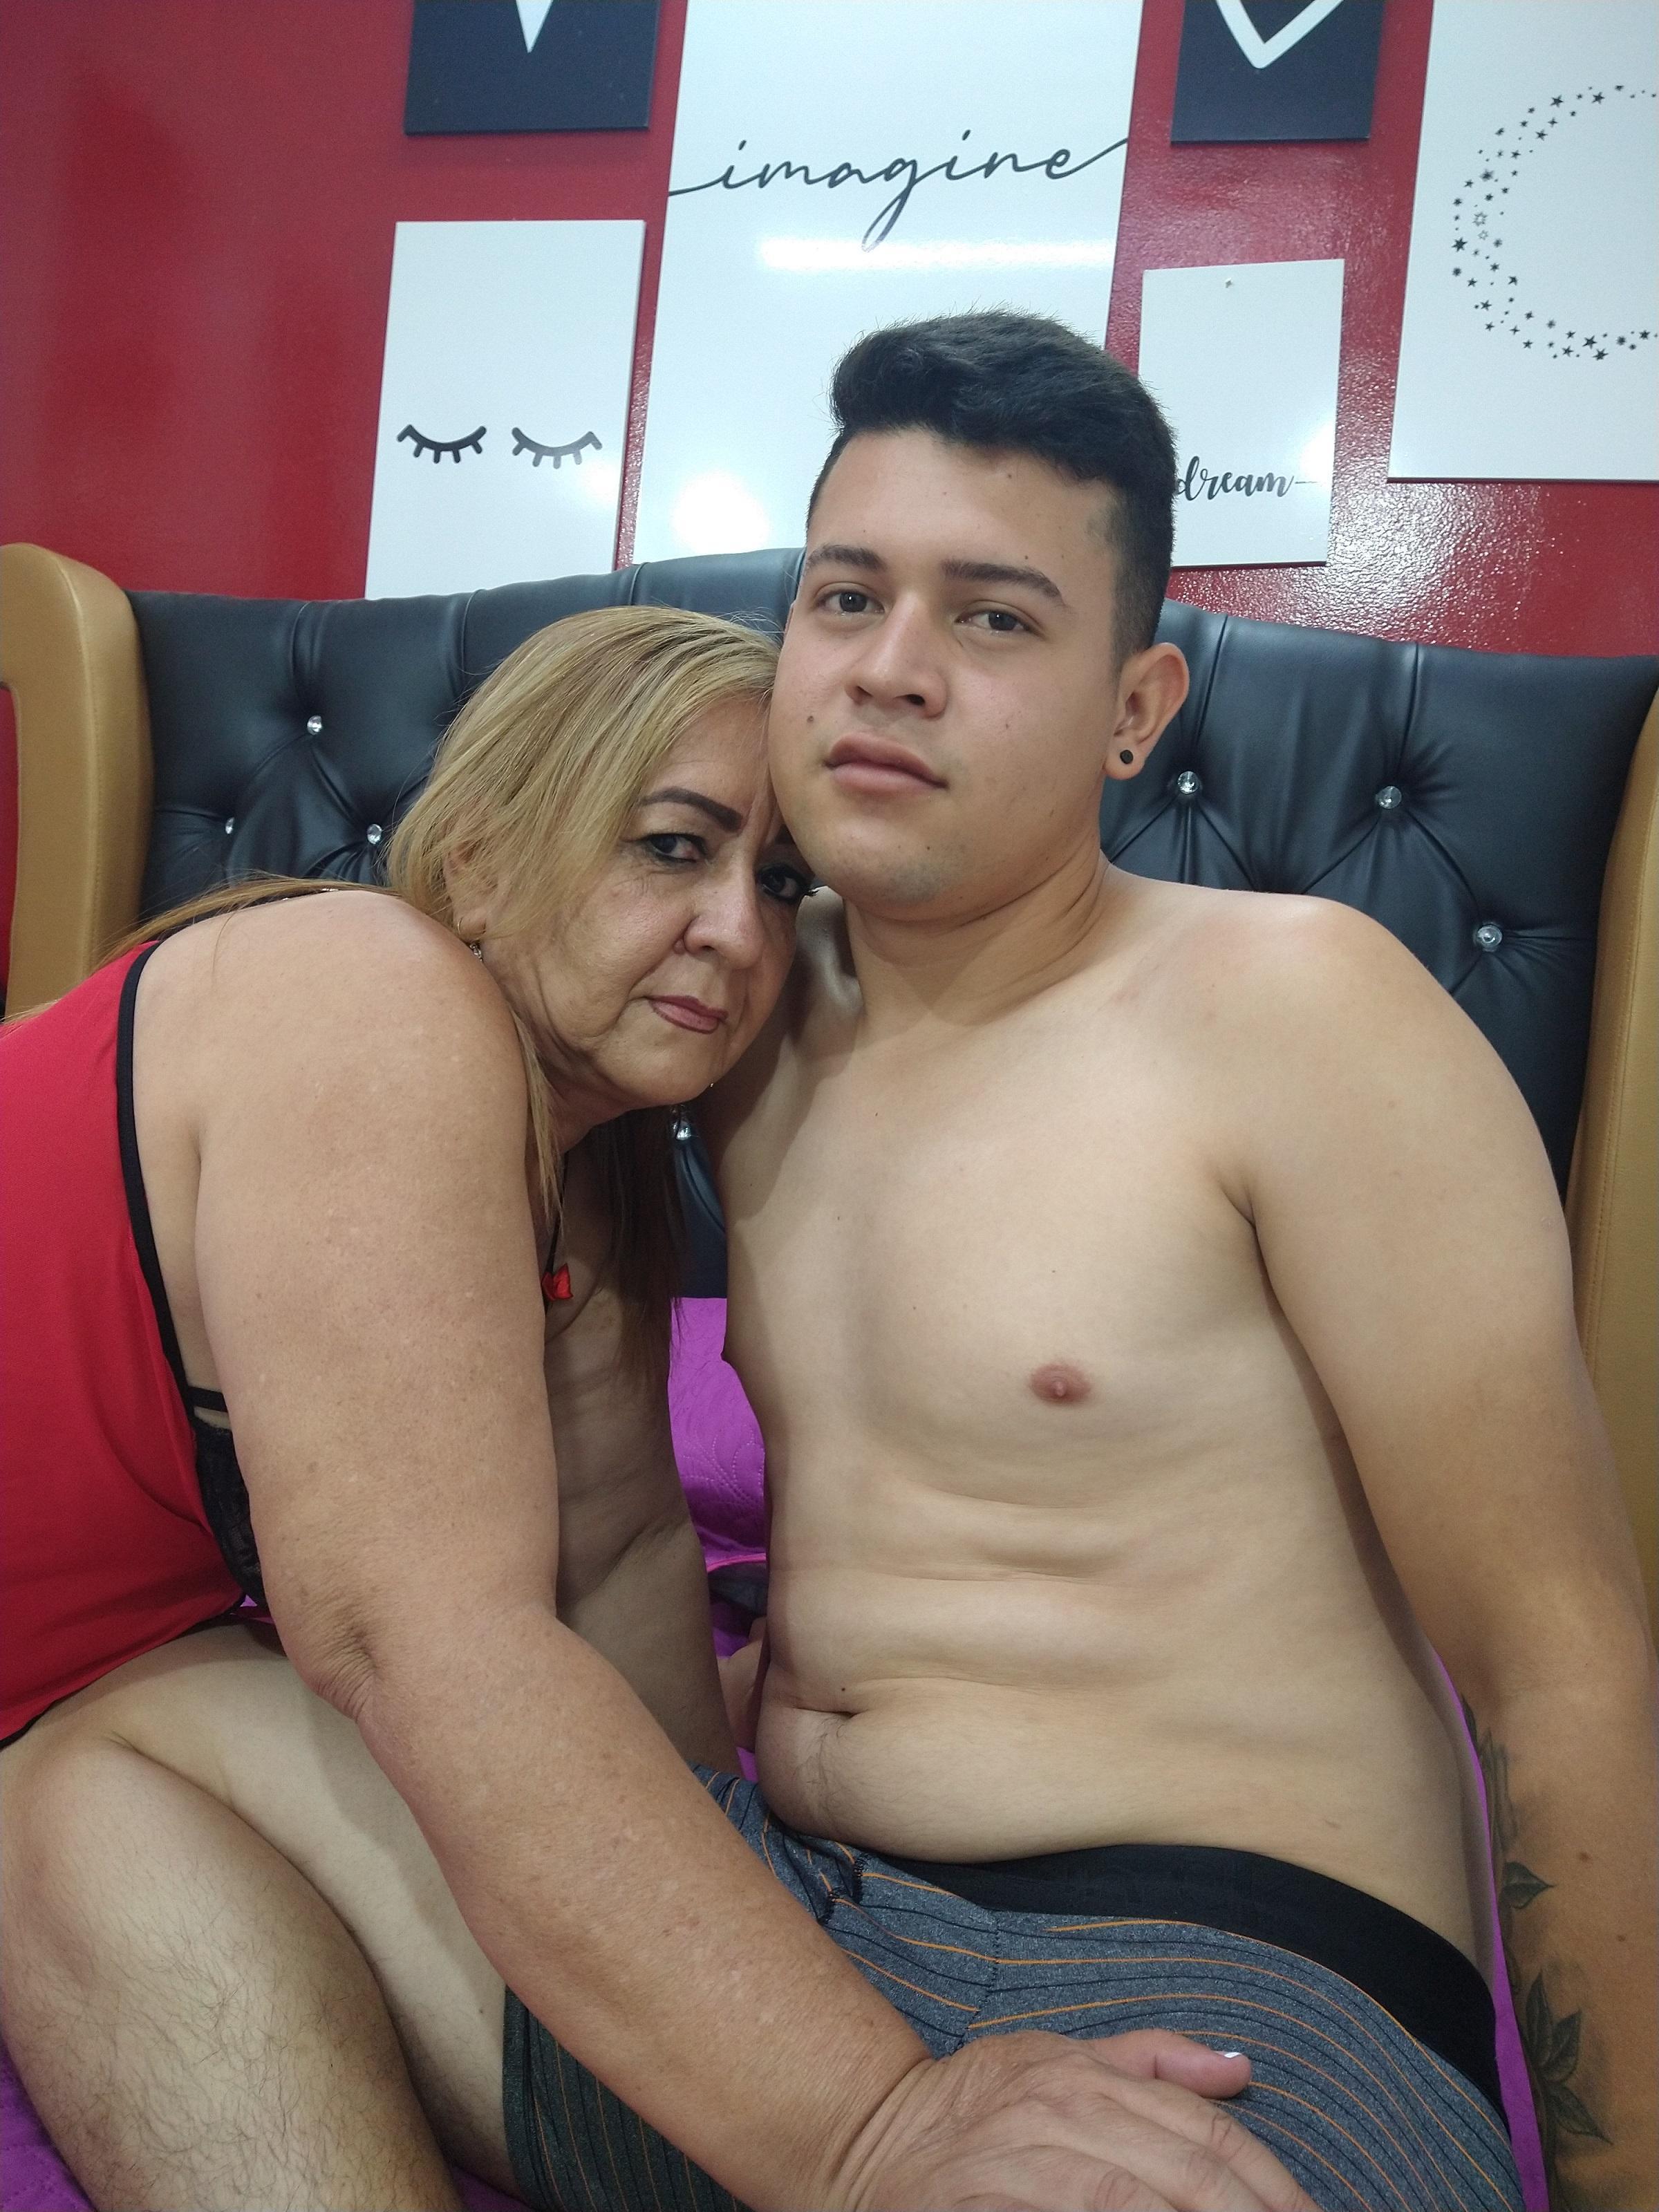 Little and mom?s=vxg9ha6njs9dmux16bpixyn3z7fotl26zczm9bkdcoy=